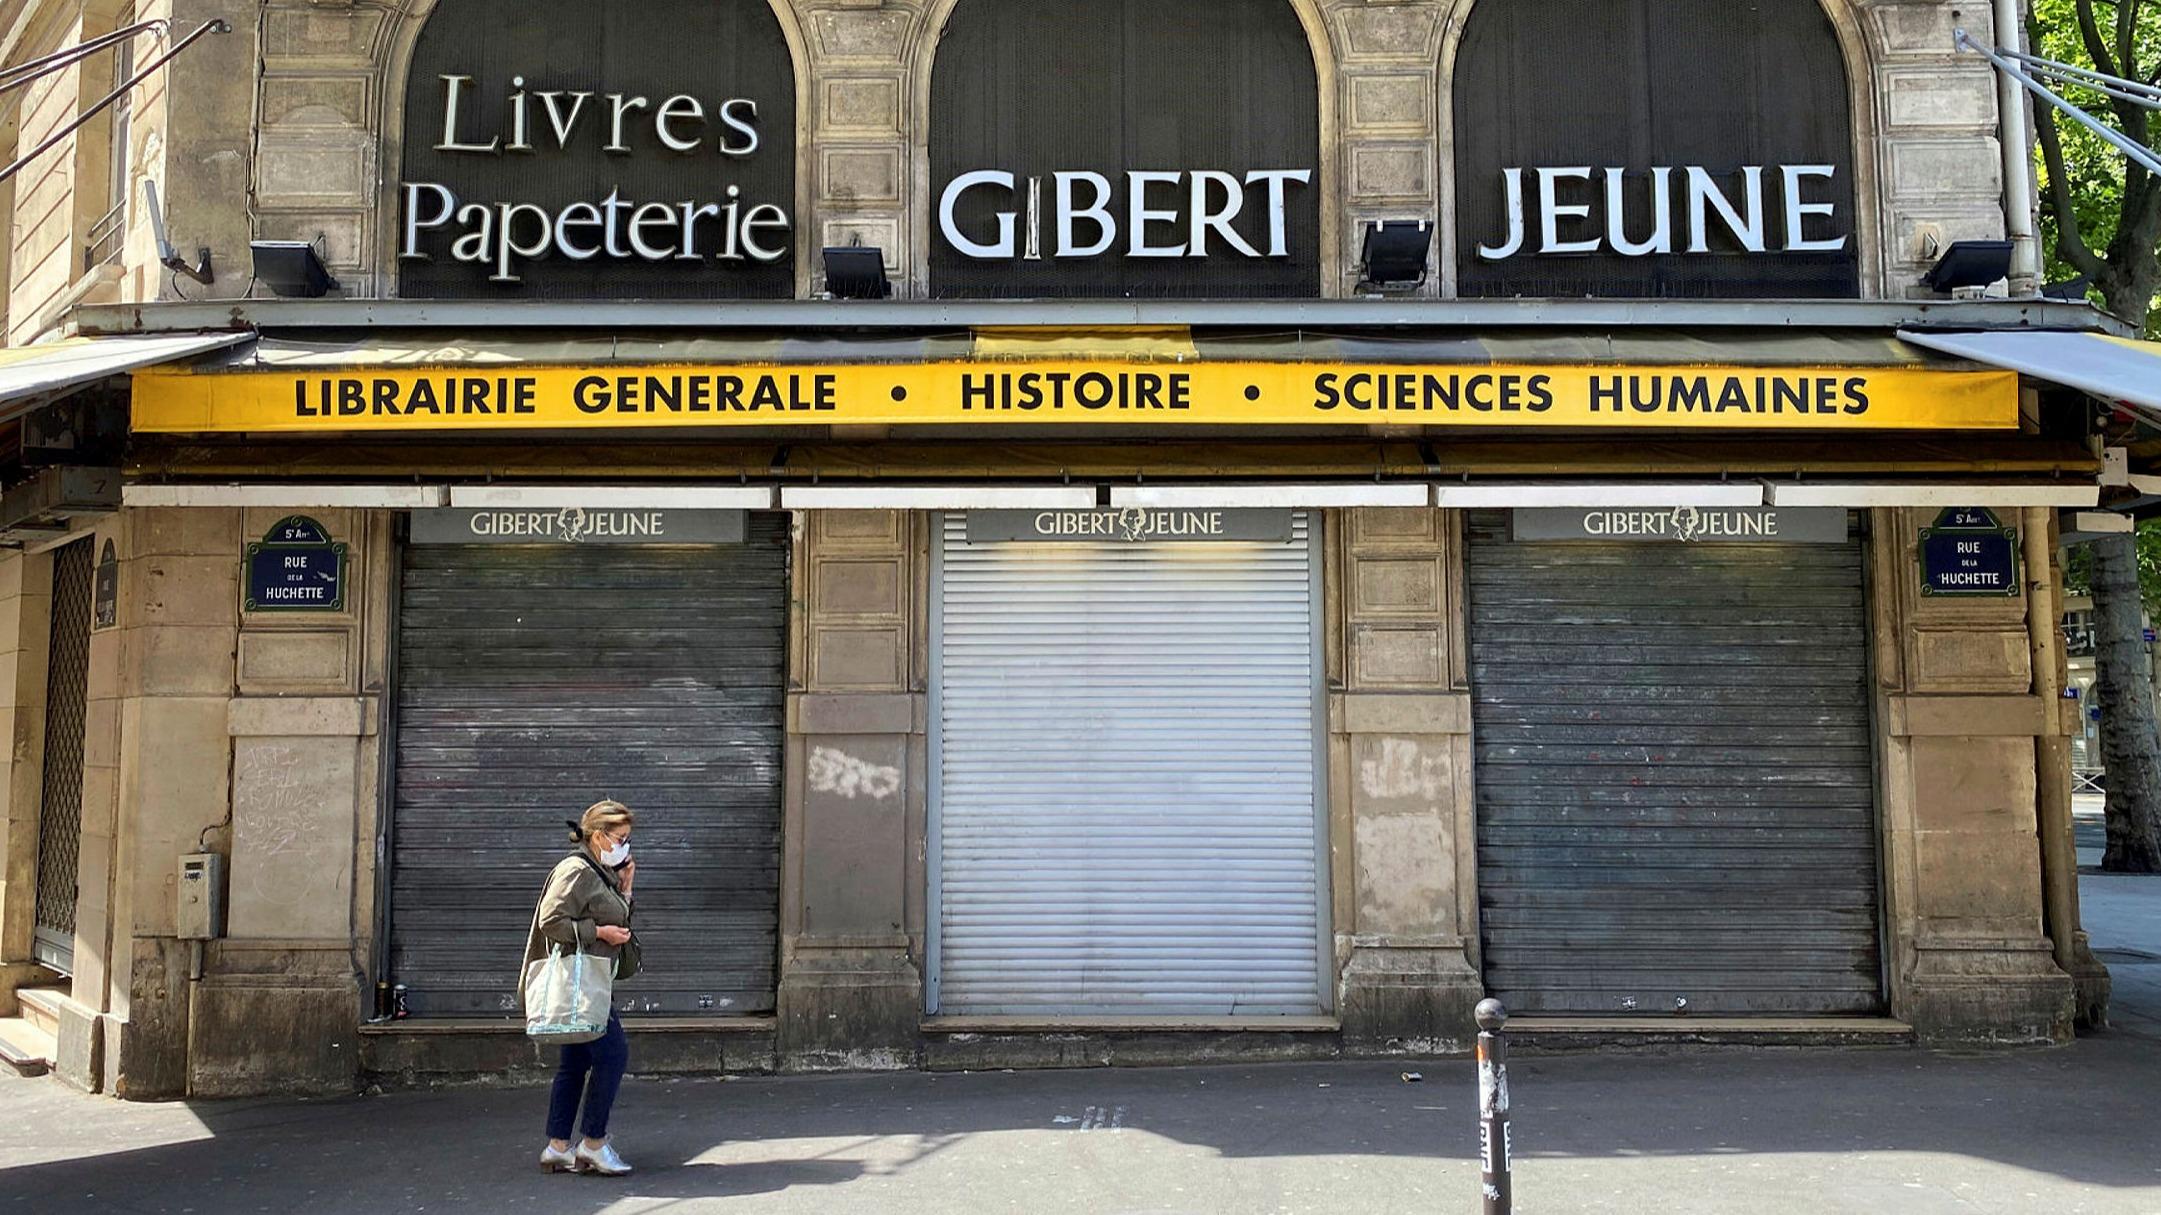 ft.com - Leila Abboud - Troubles of famed Paris bookshop expose French retail shift